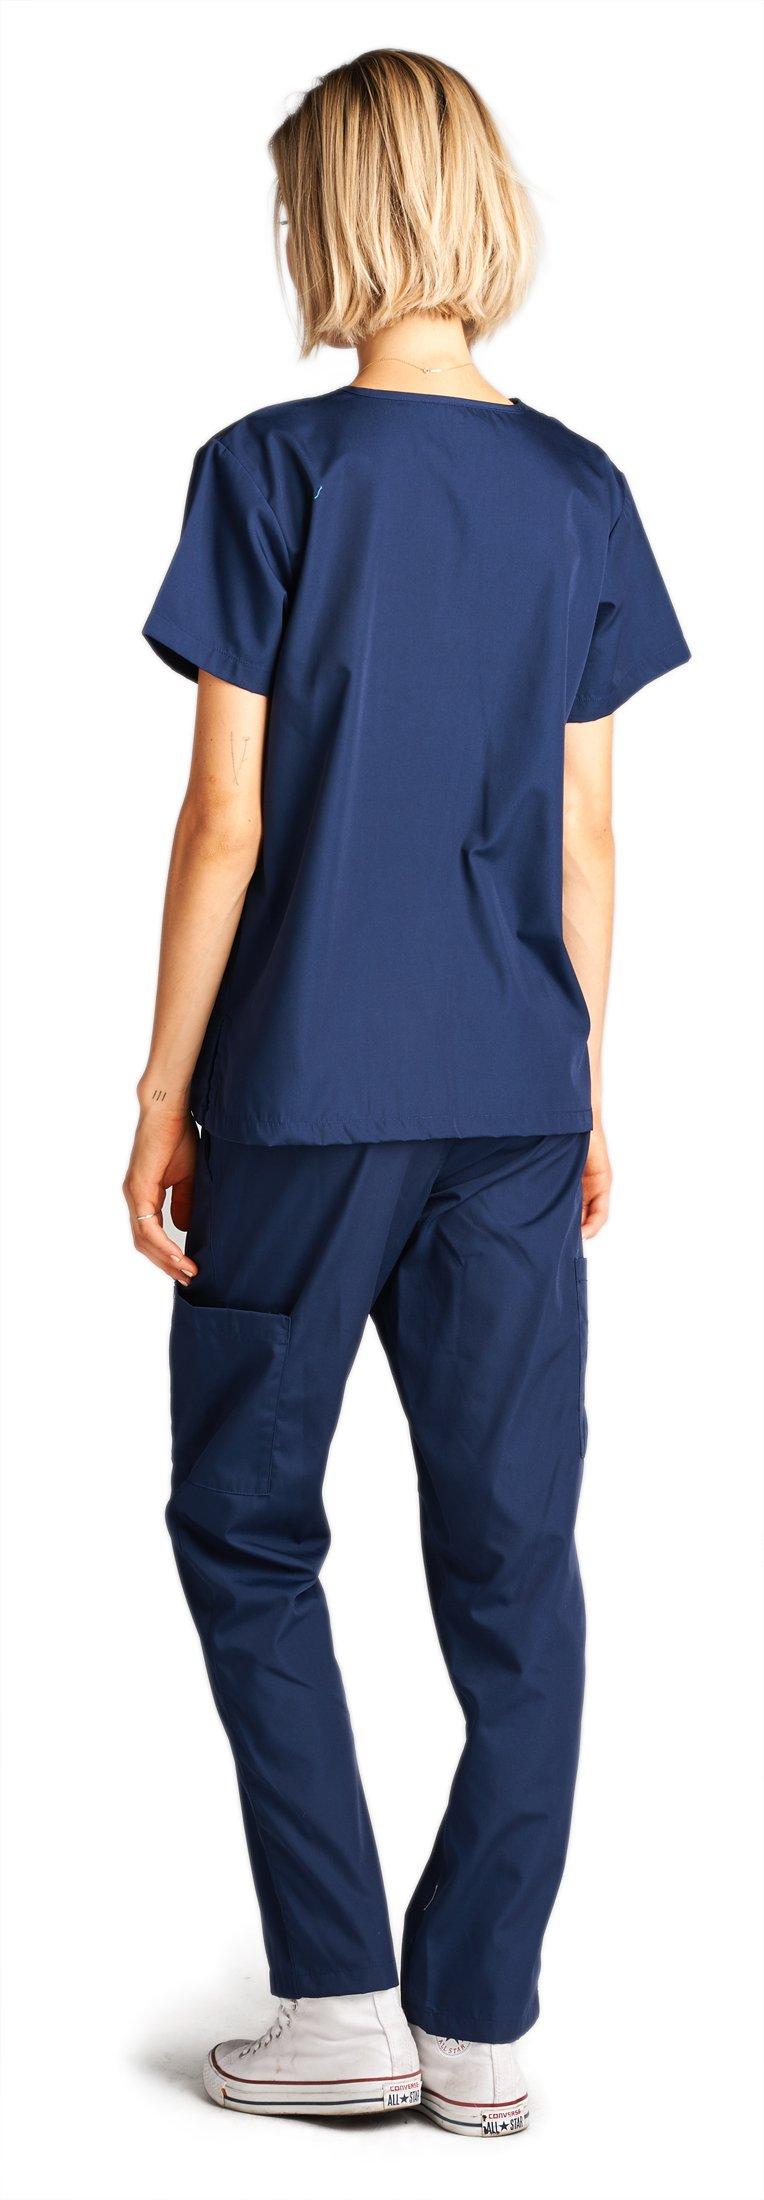 Dagacci Medical Uniform Woman and Man Scrub Set Unisex Medical Scrub Top and Pant, NAVY, M by Dagacci Medical Uniform (Image #3)